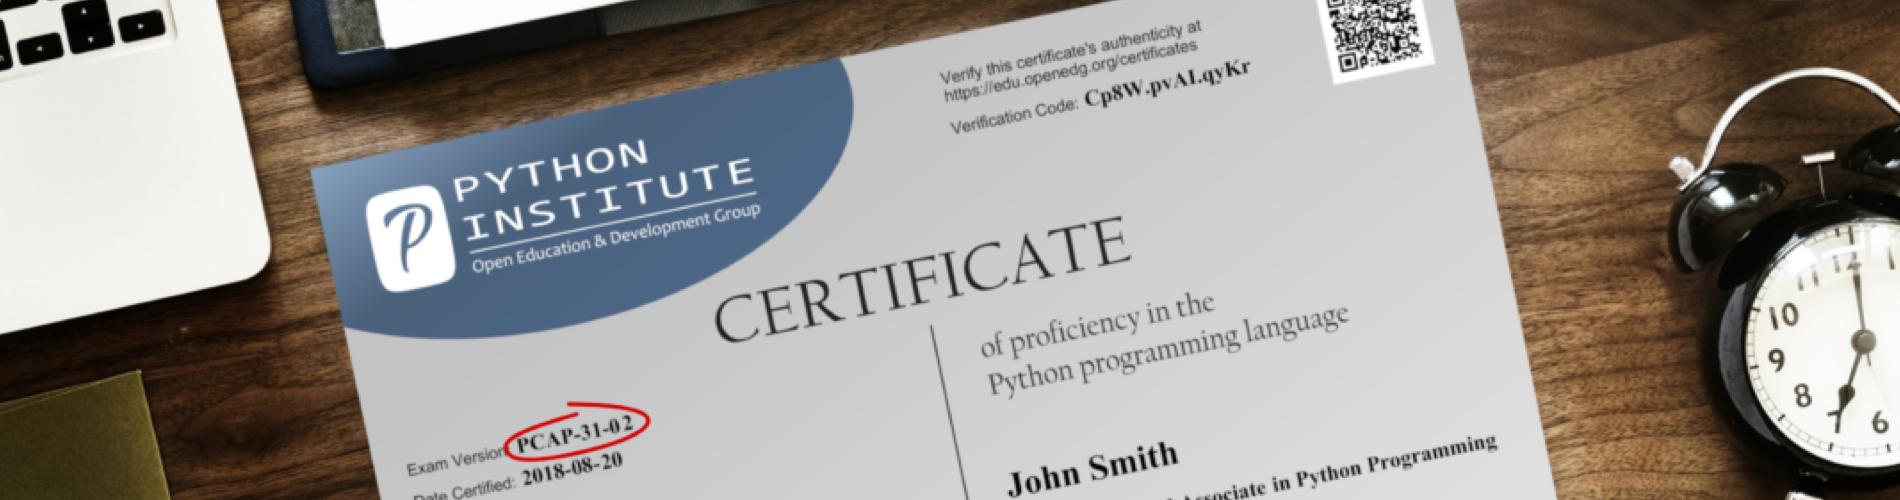 Python Certs feature image